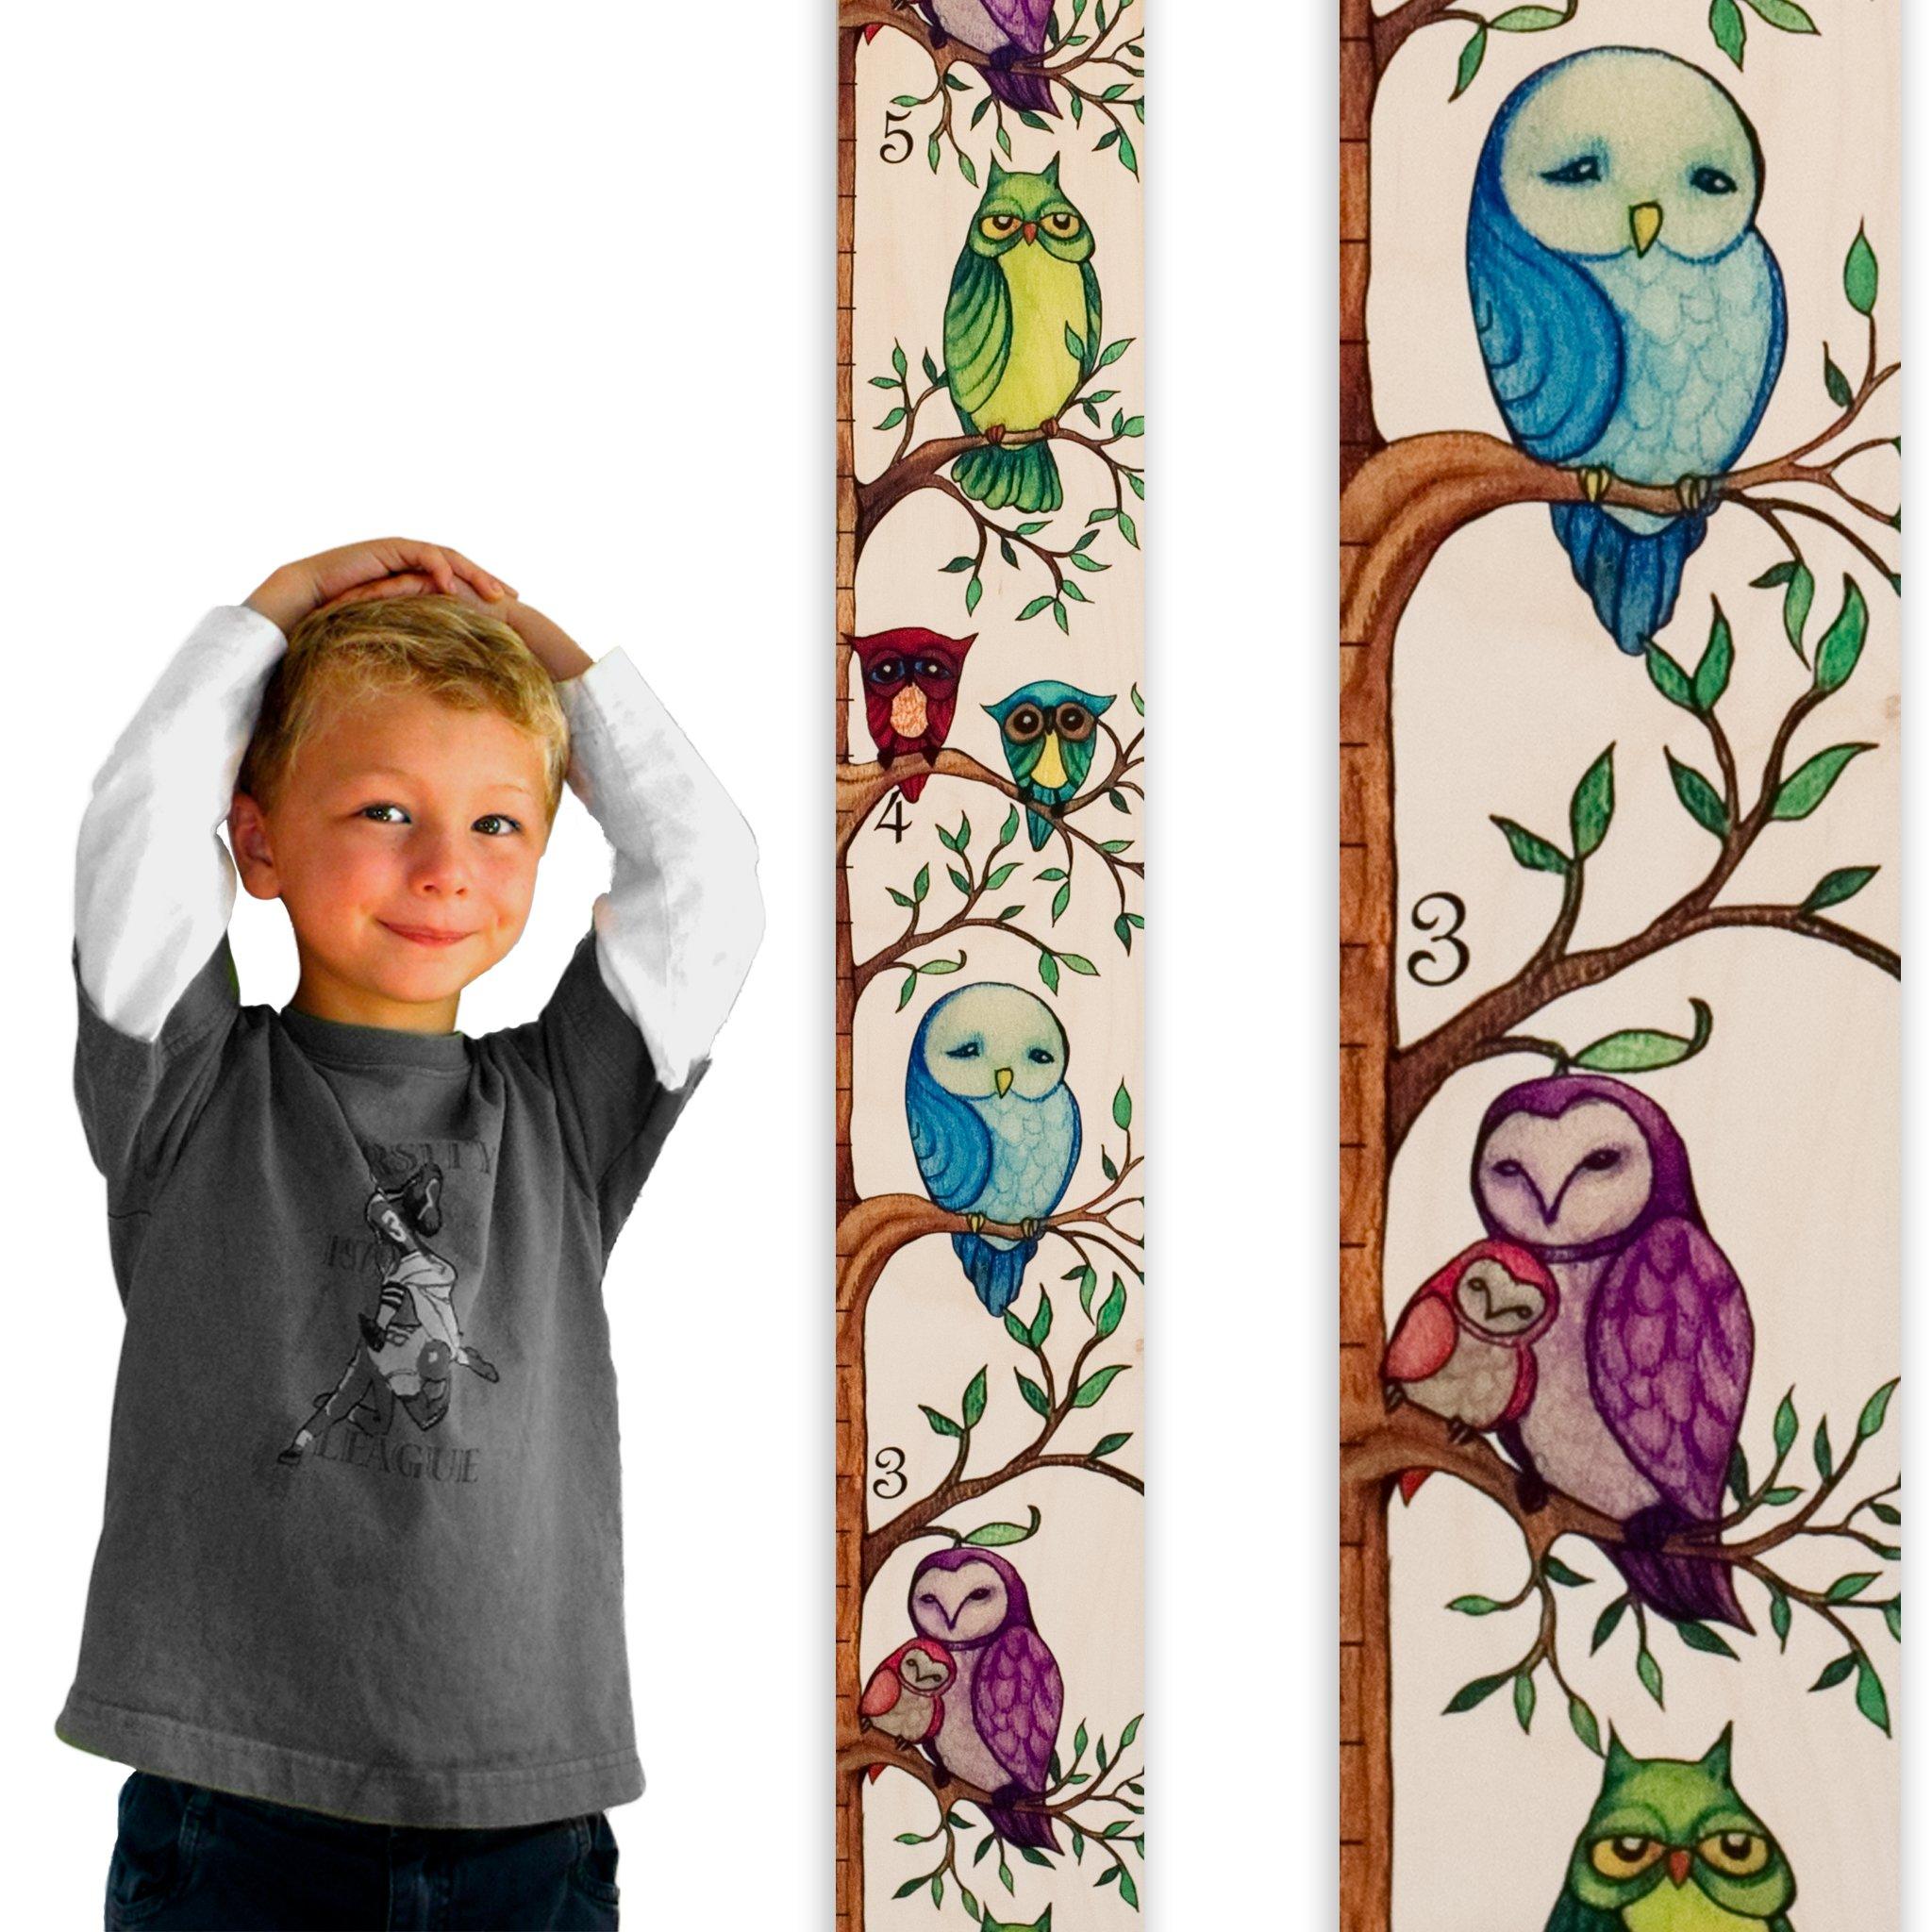 Growth Chart Art | Owl Growth Chart | Wooden Height Chart for Measuring Kids, Boys & Girls | Owls